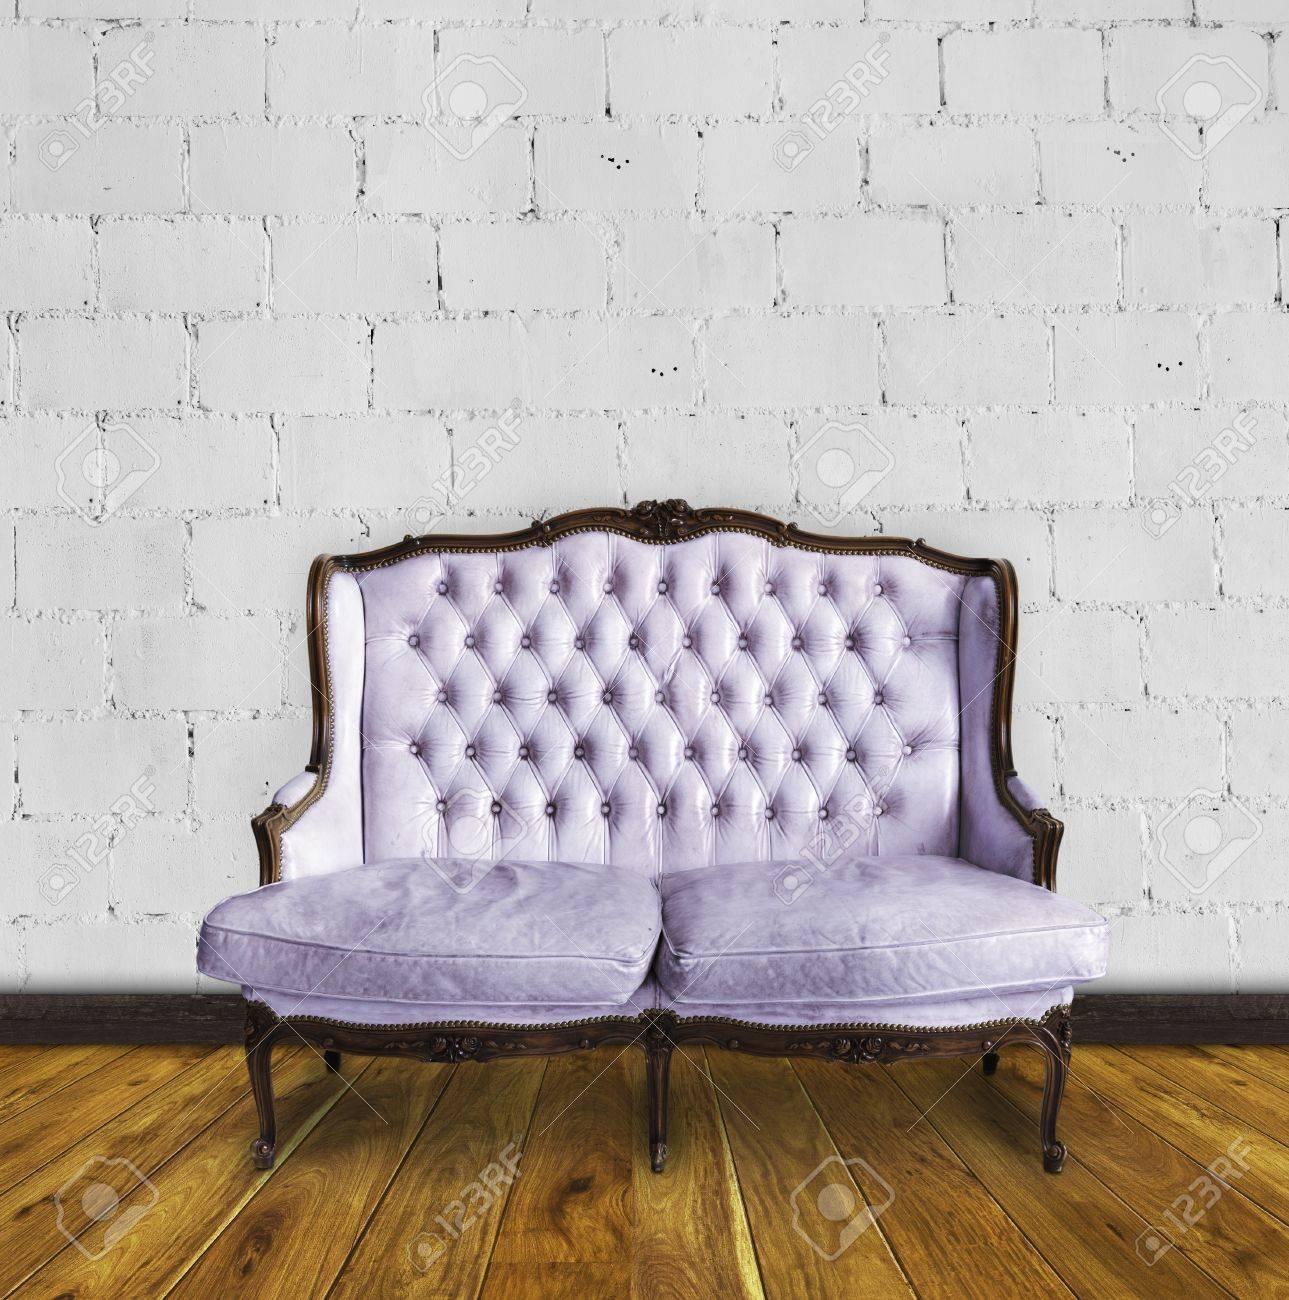 retro sofa in colorful room ,interior details Stock Photo - 13080739